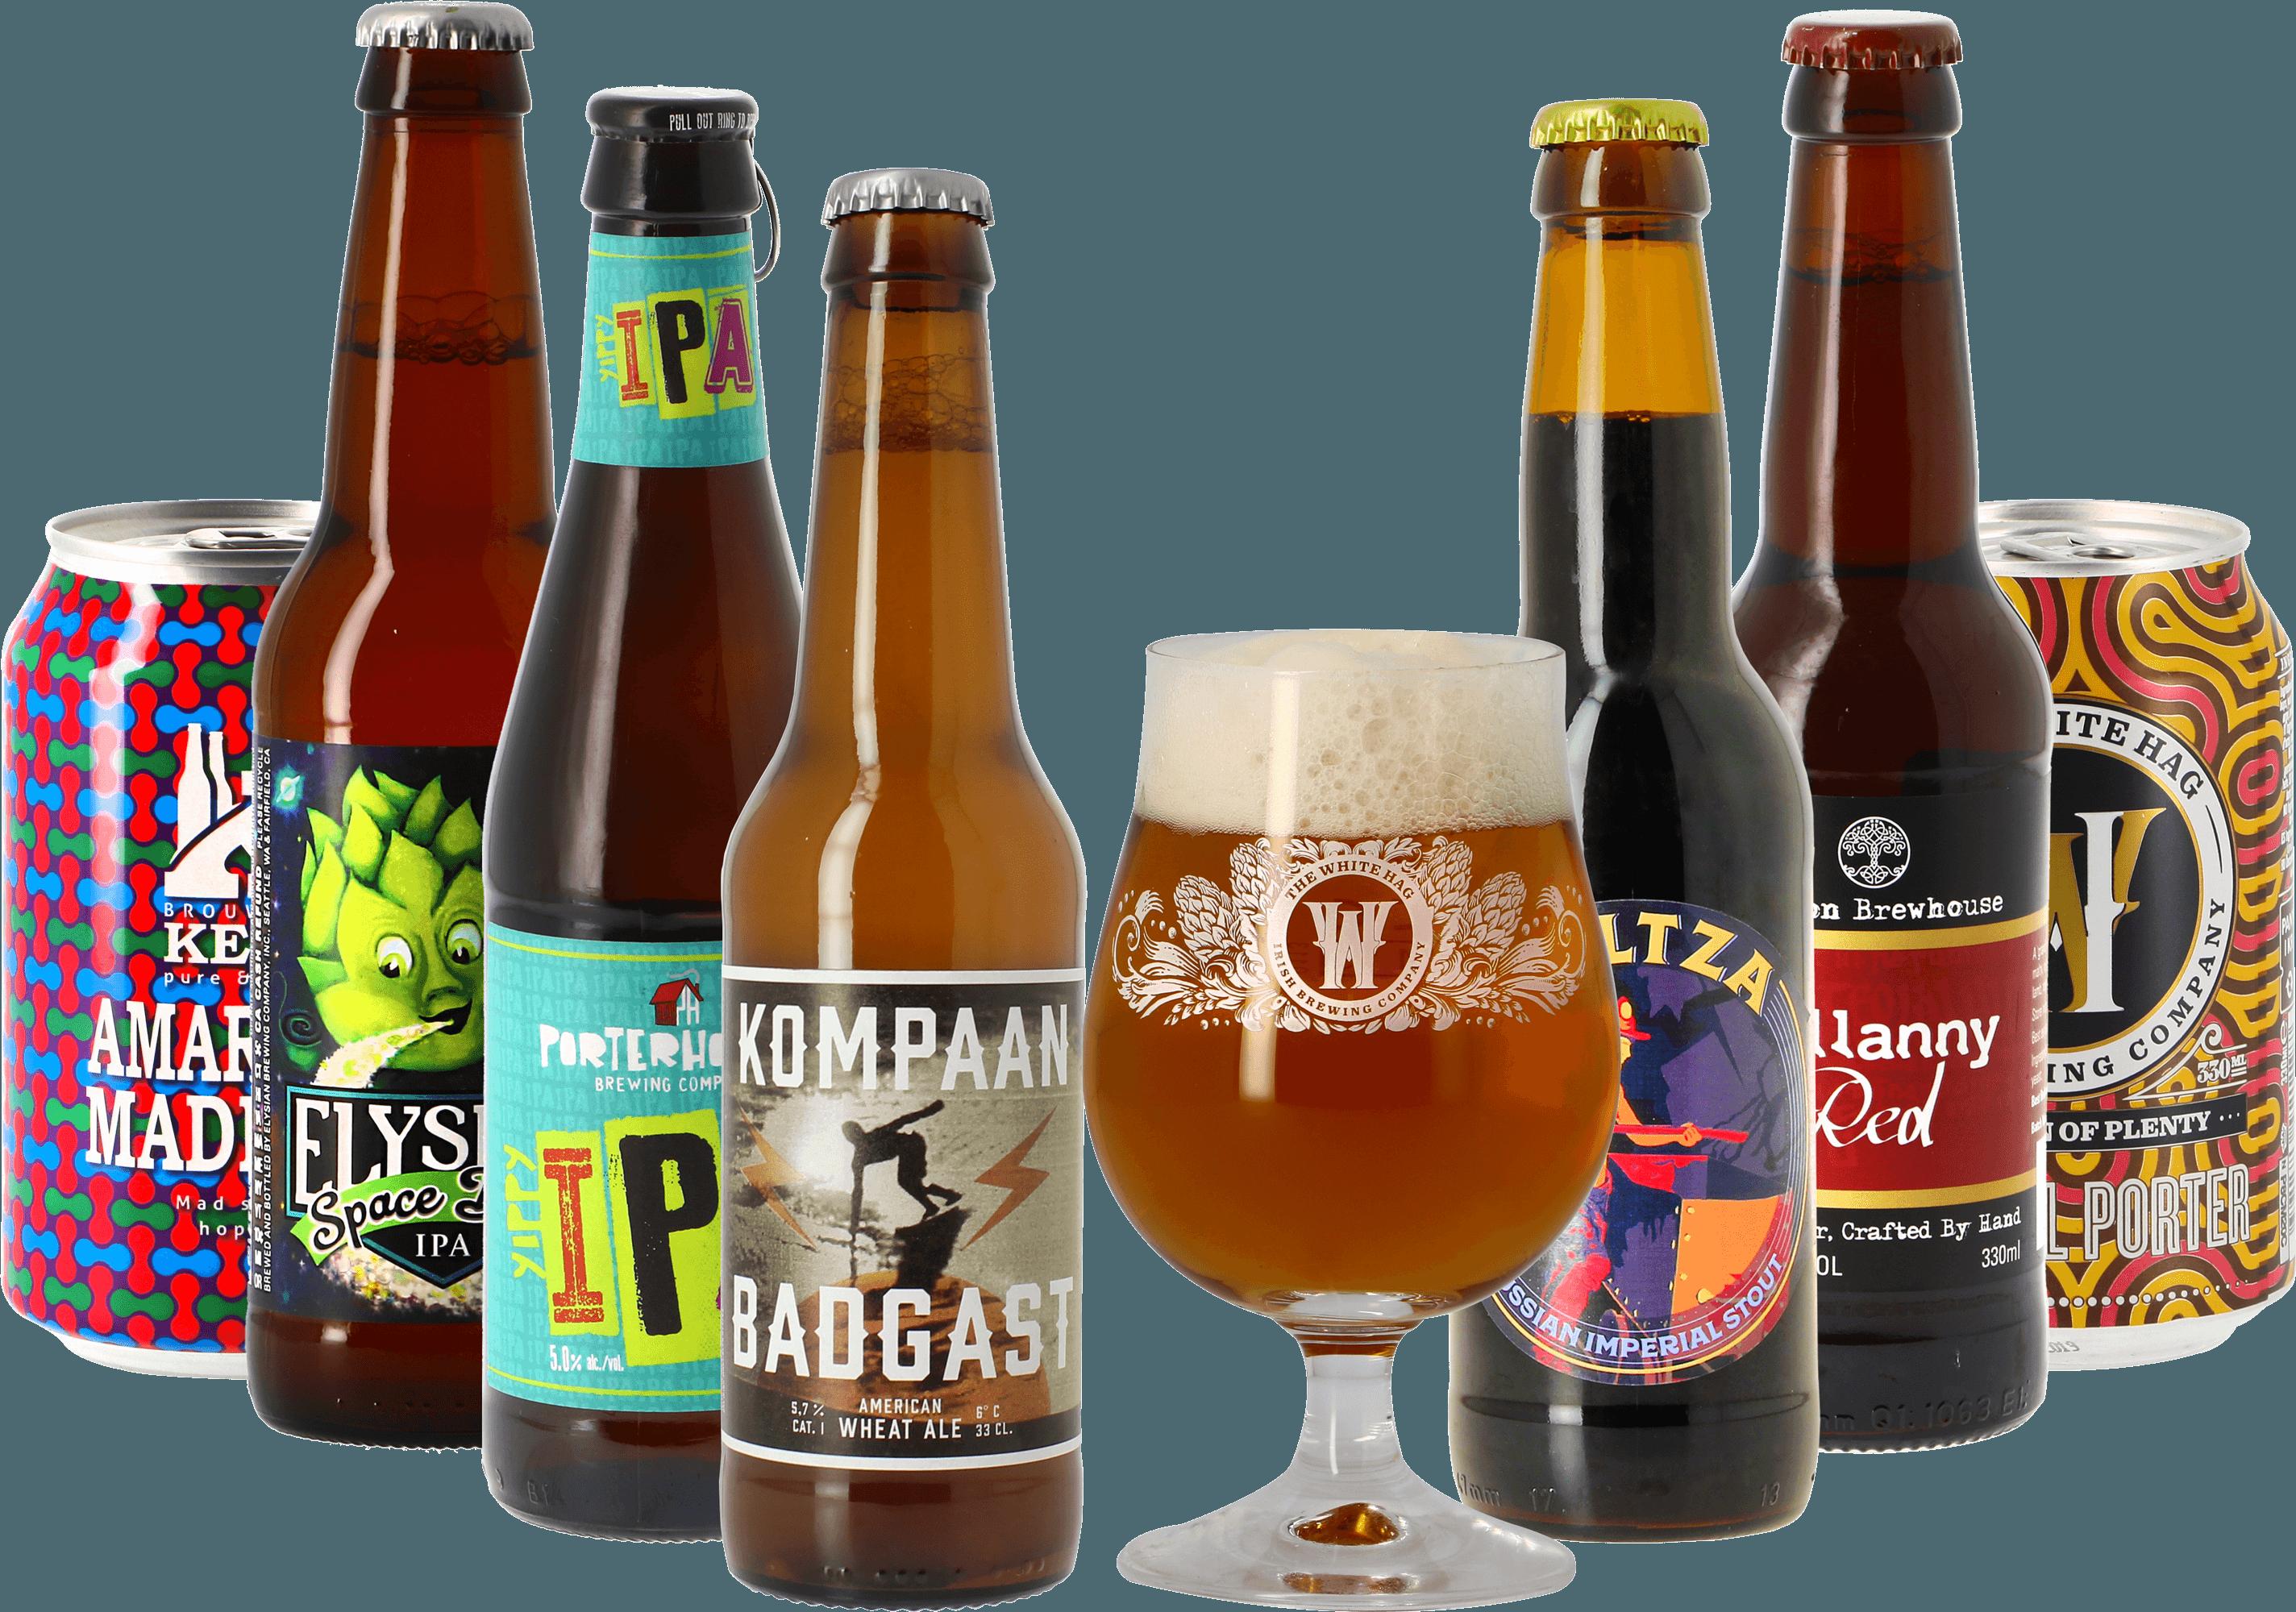 White Hag Brewery